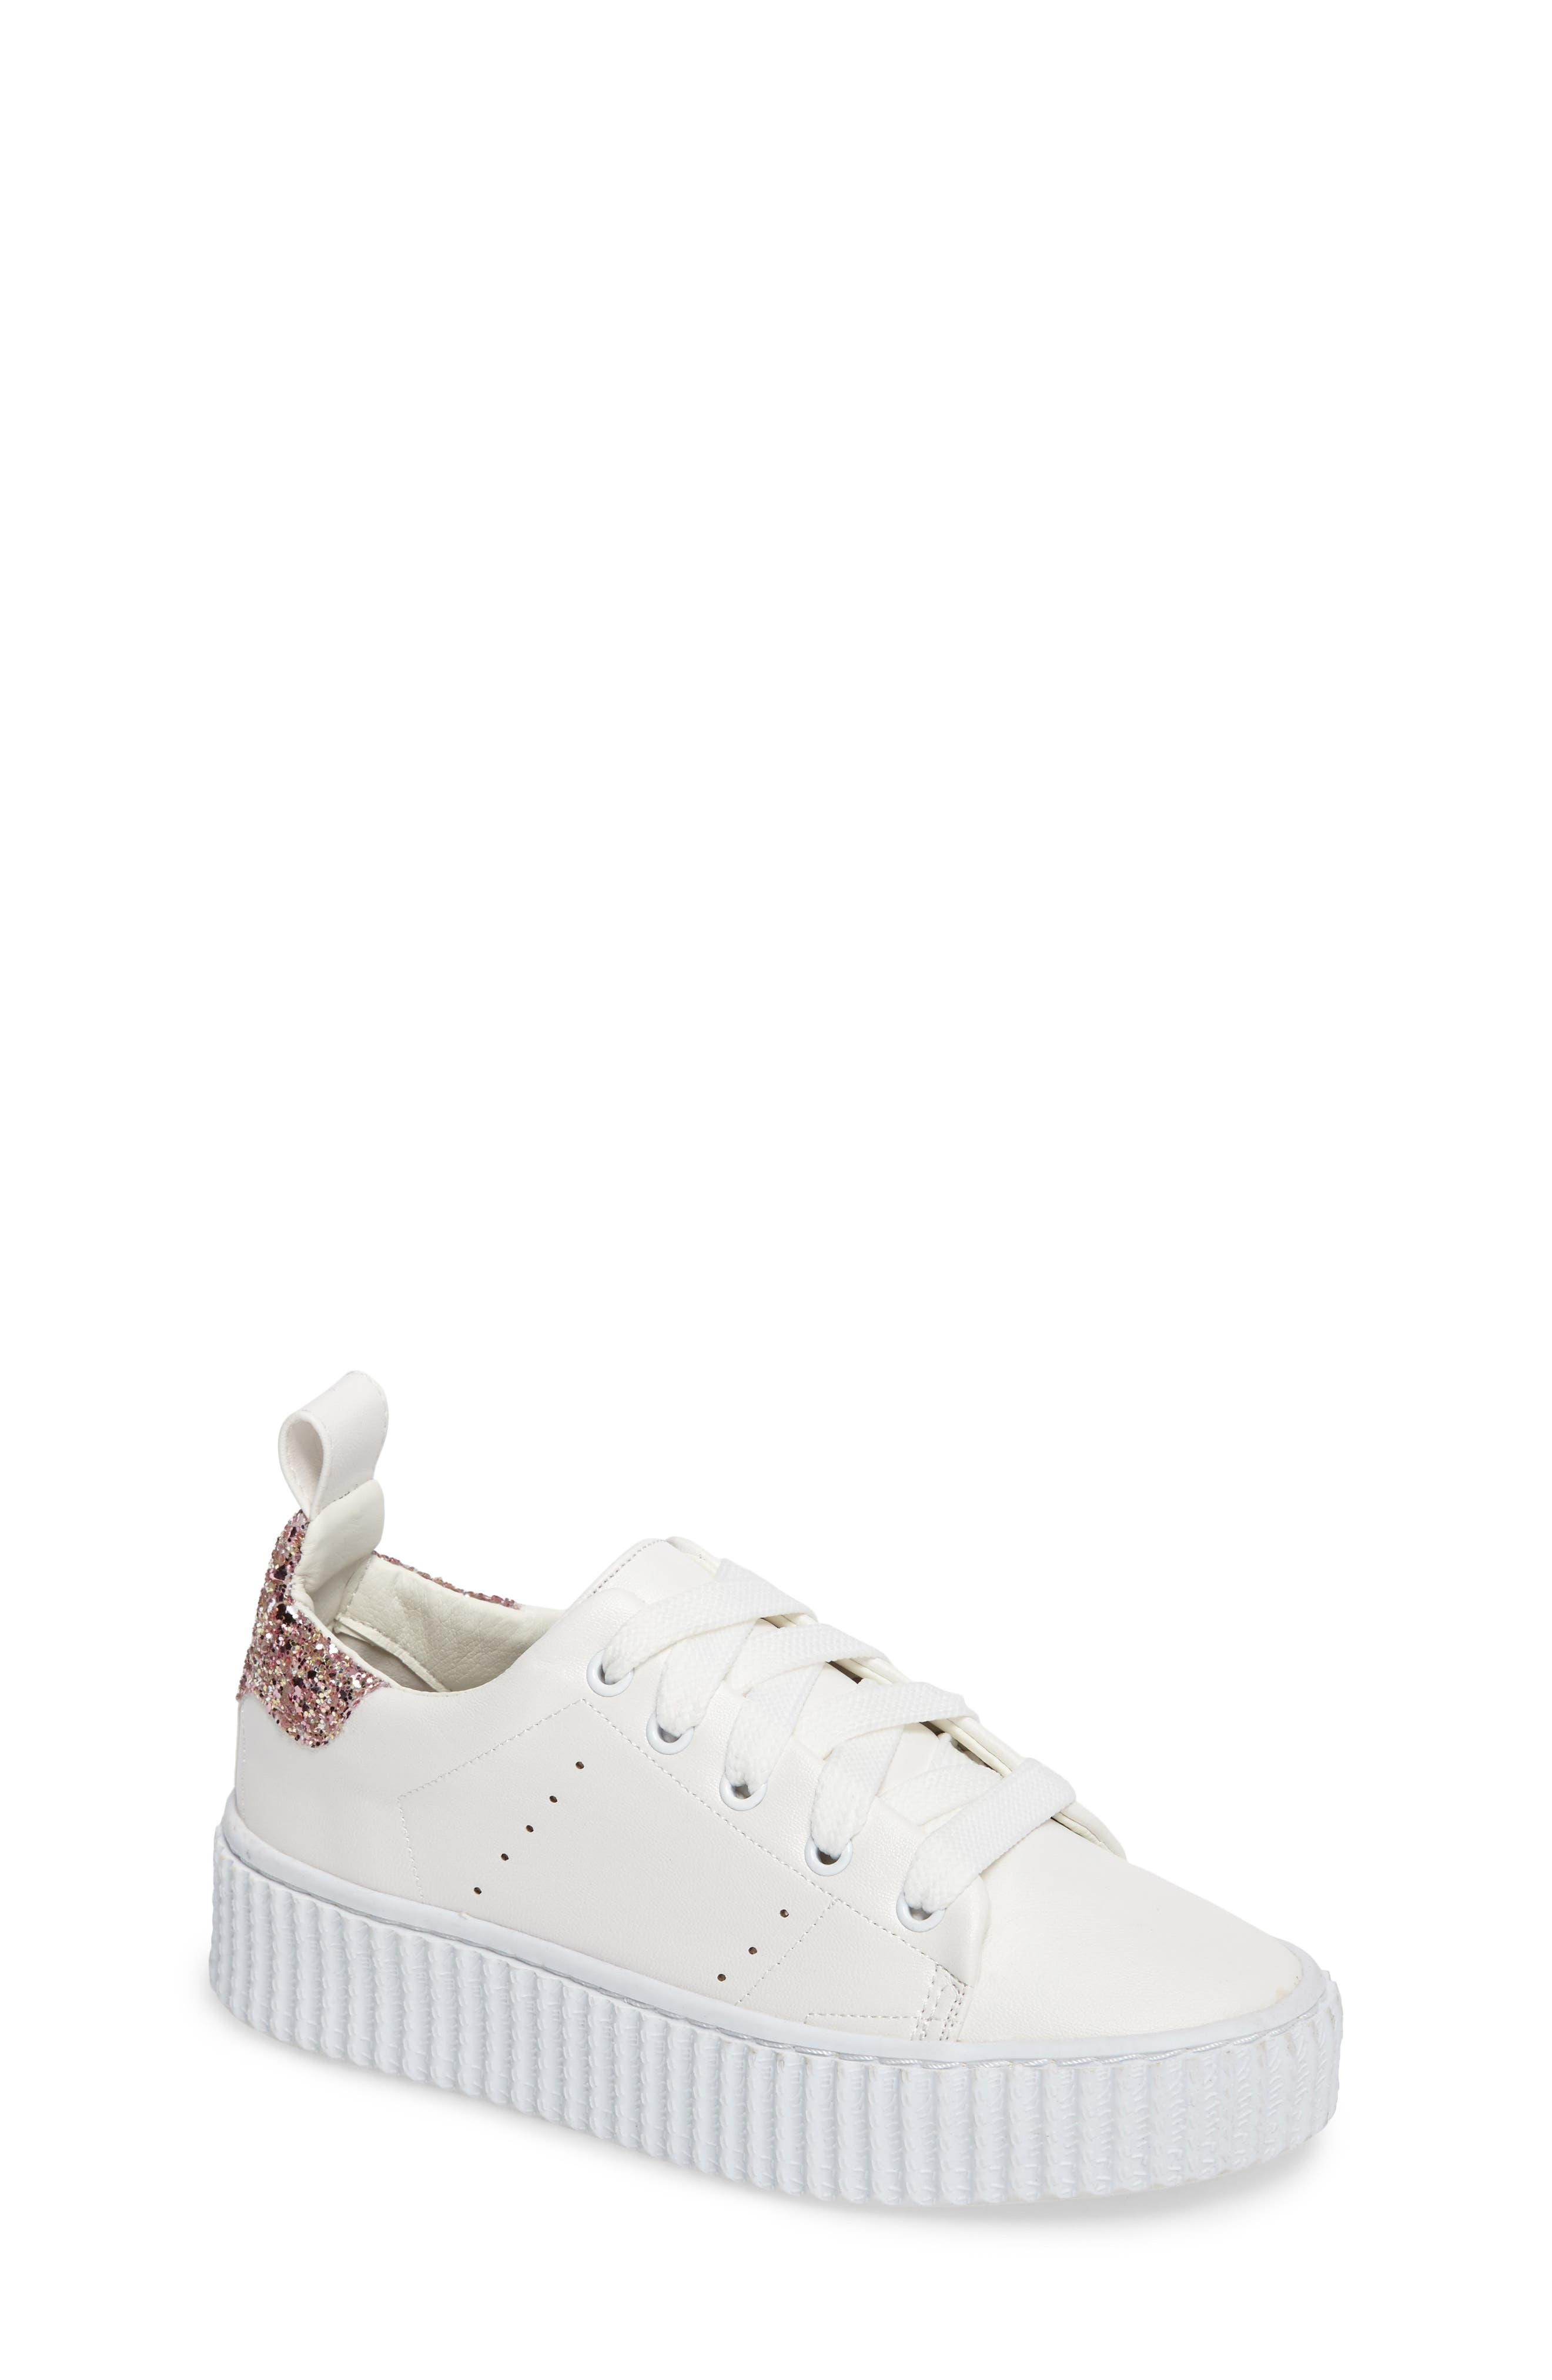 Main Image - Dolce Vita Wren Glitter Heel Sneaker (Toddler, Little Kid & Big Kid)